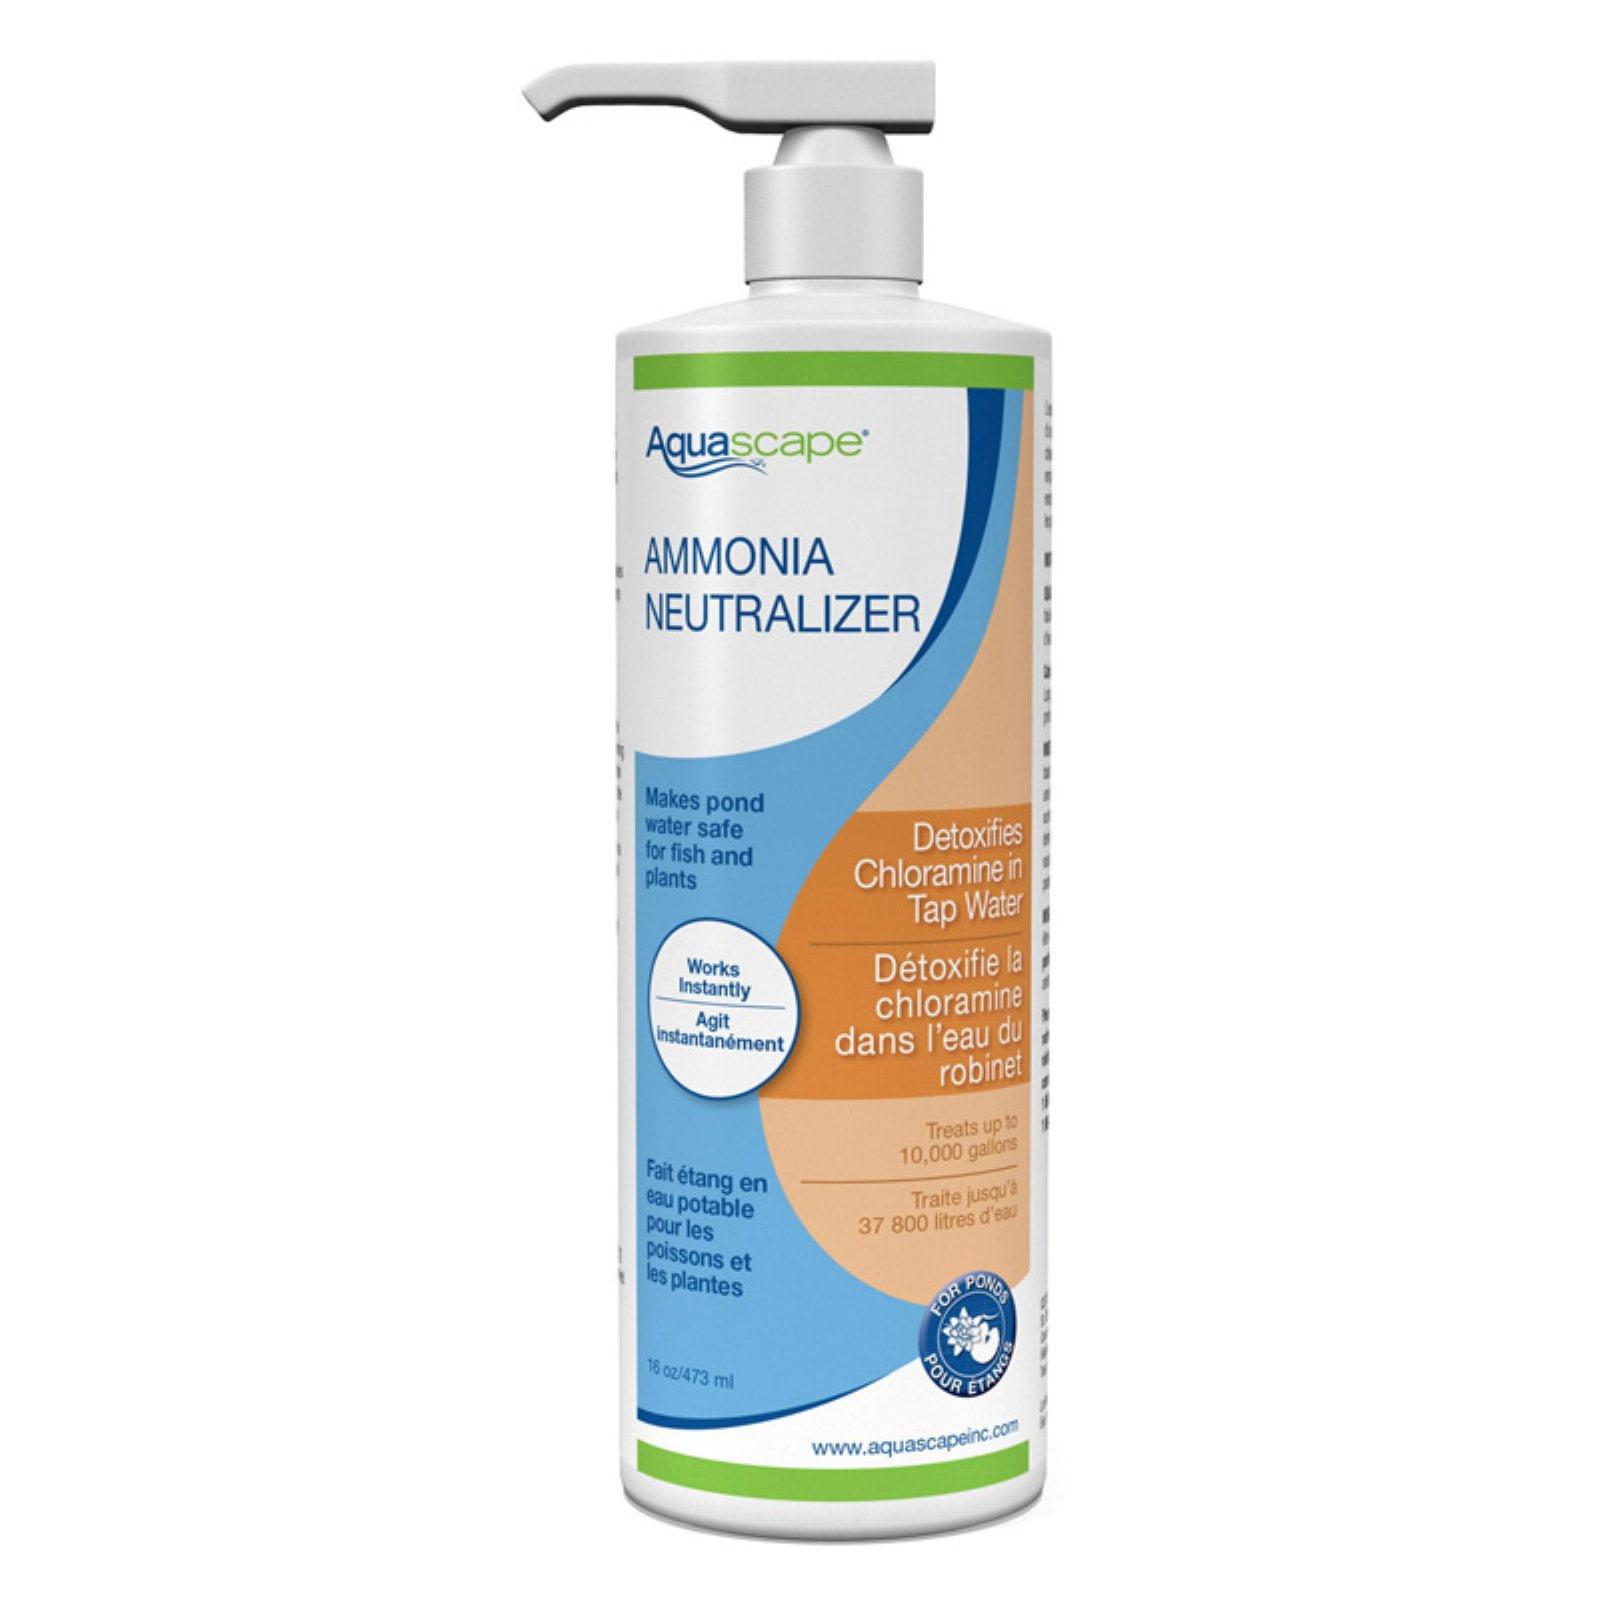 Aquascape Ammonia Neutralizer